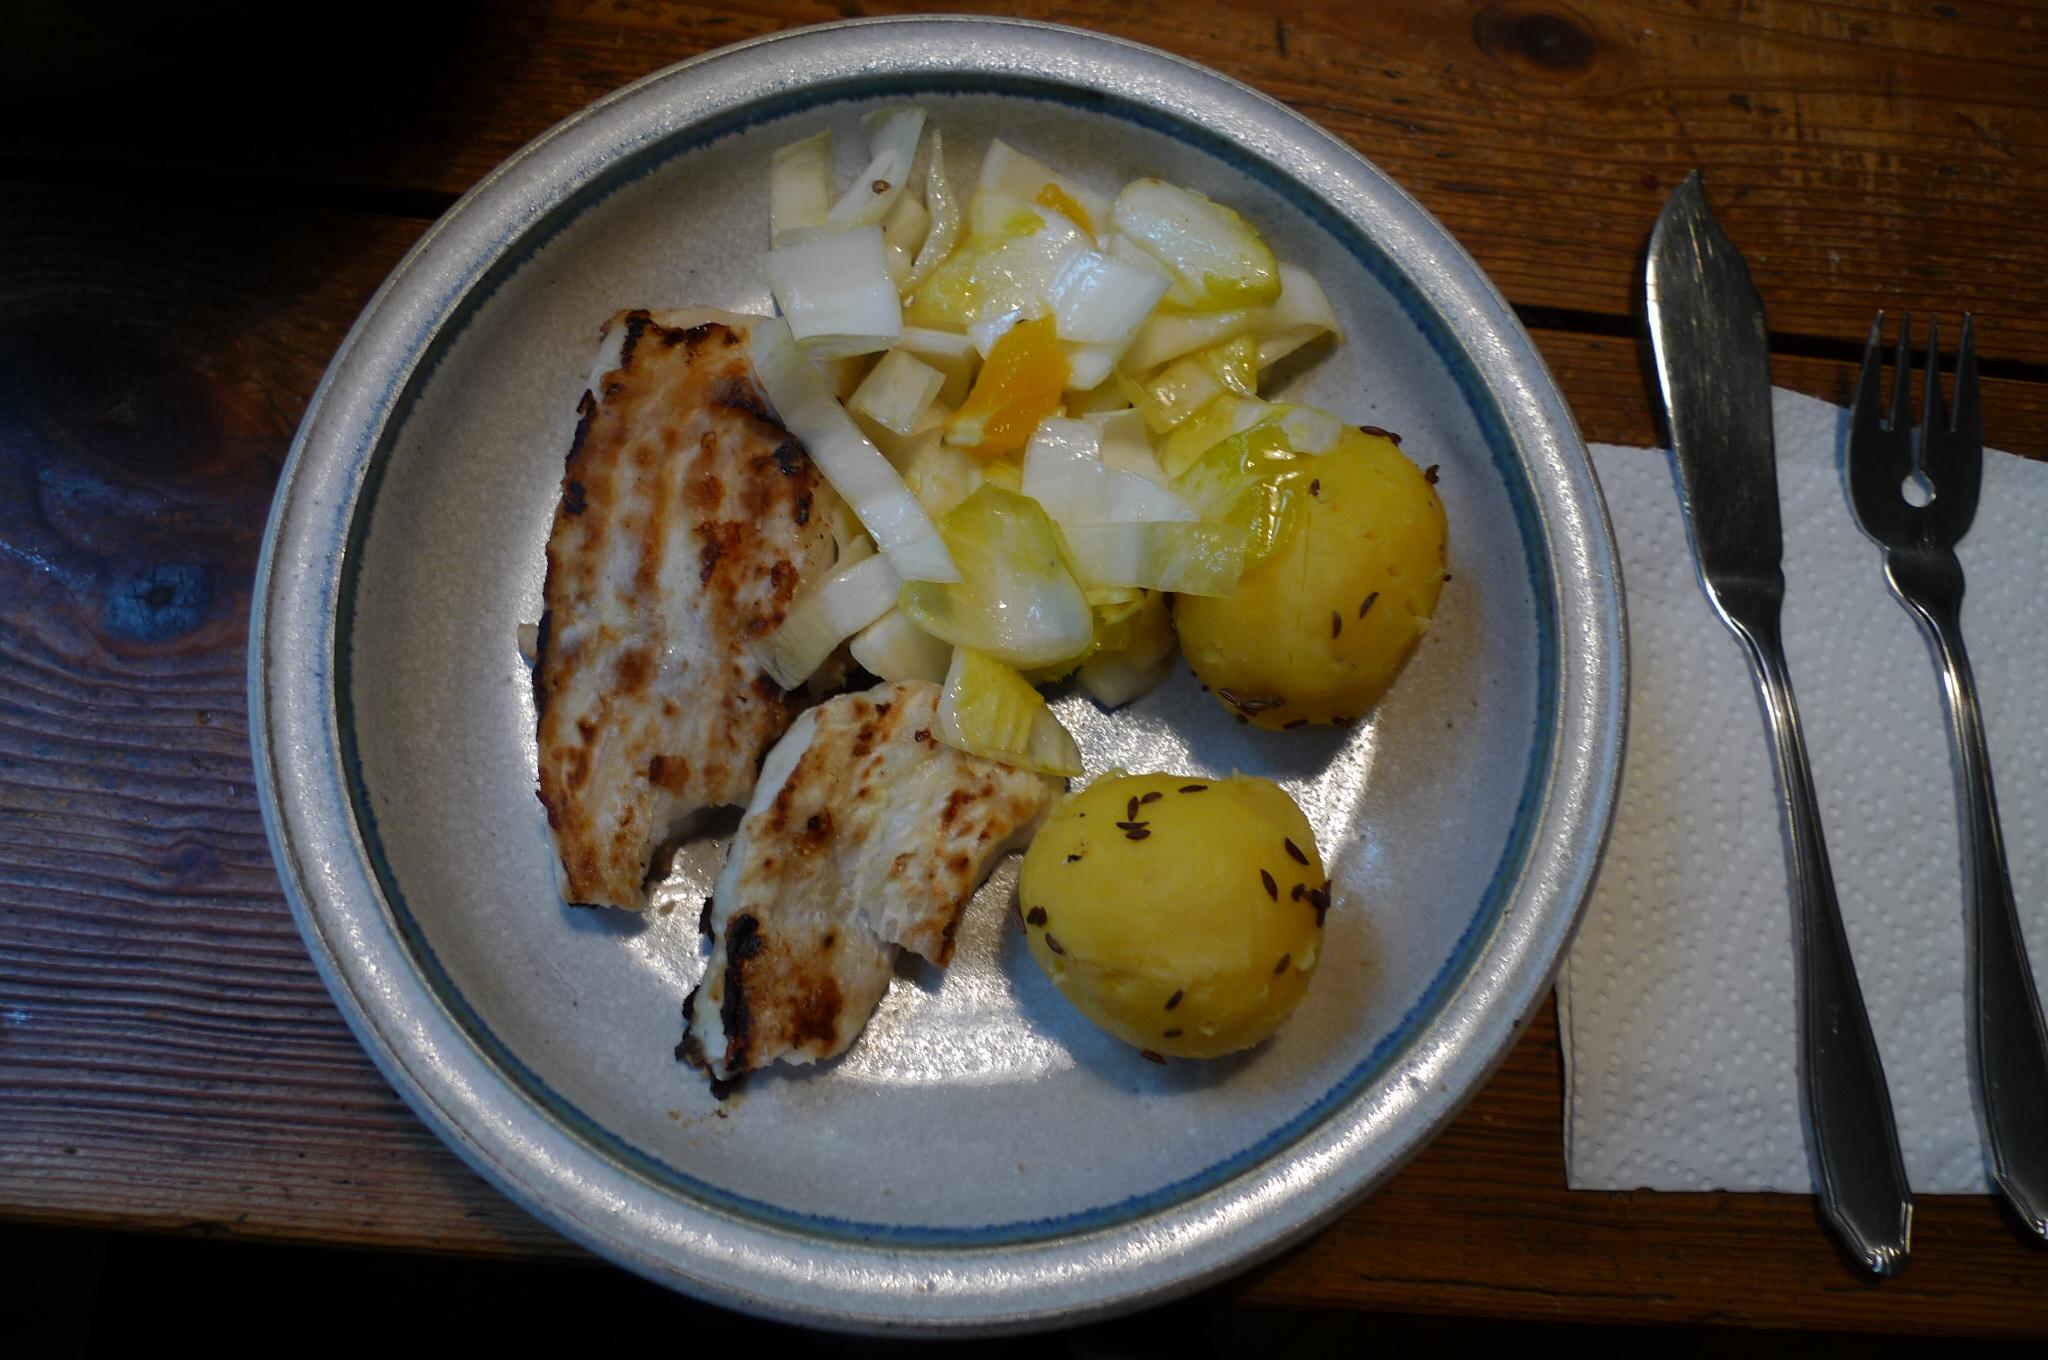 Kabeljau,Chicoreesalat,Kartoffeln,Quarkspeise - 17.2.15   (11)